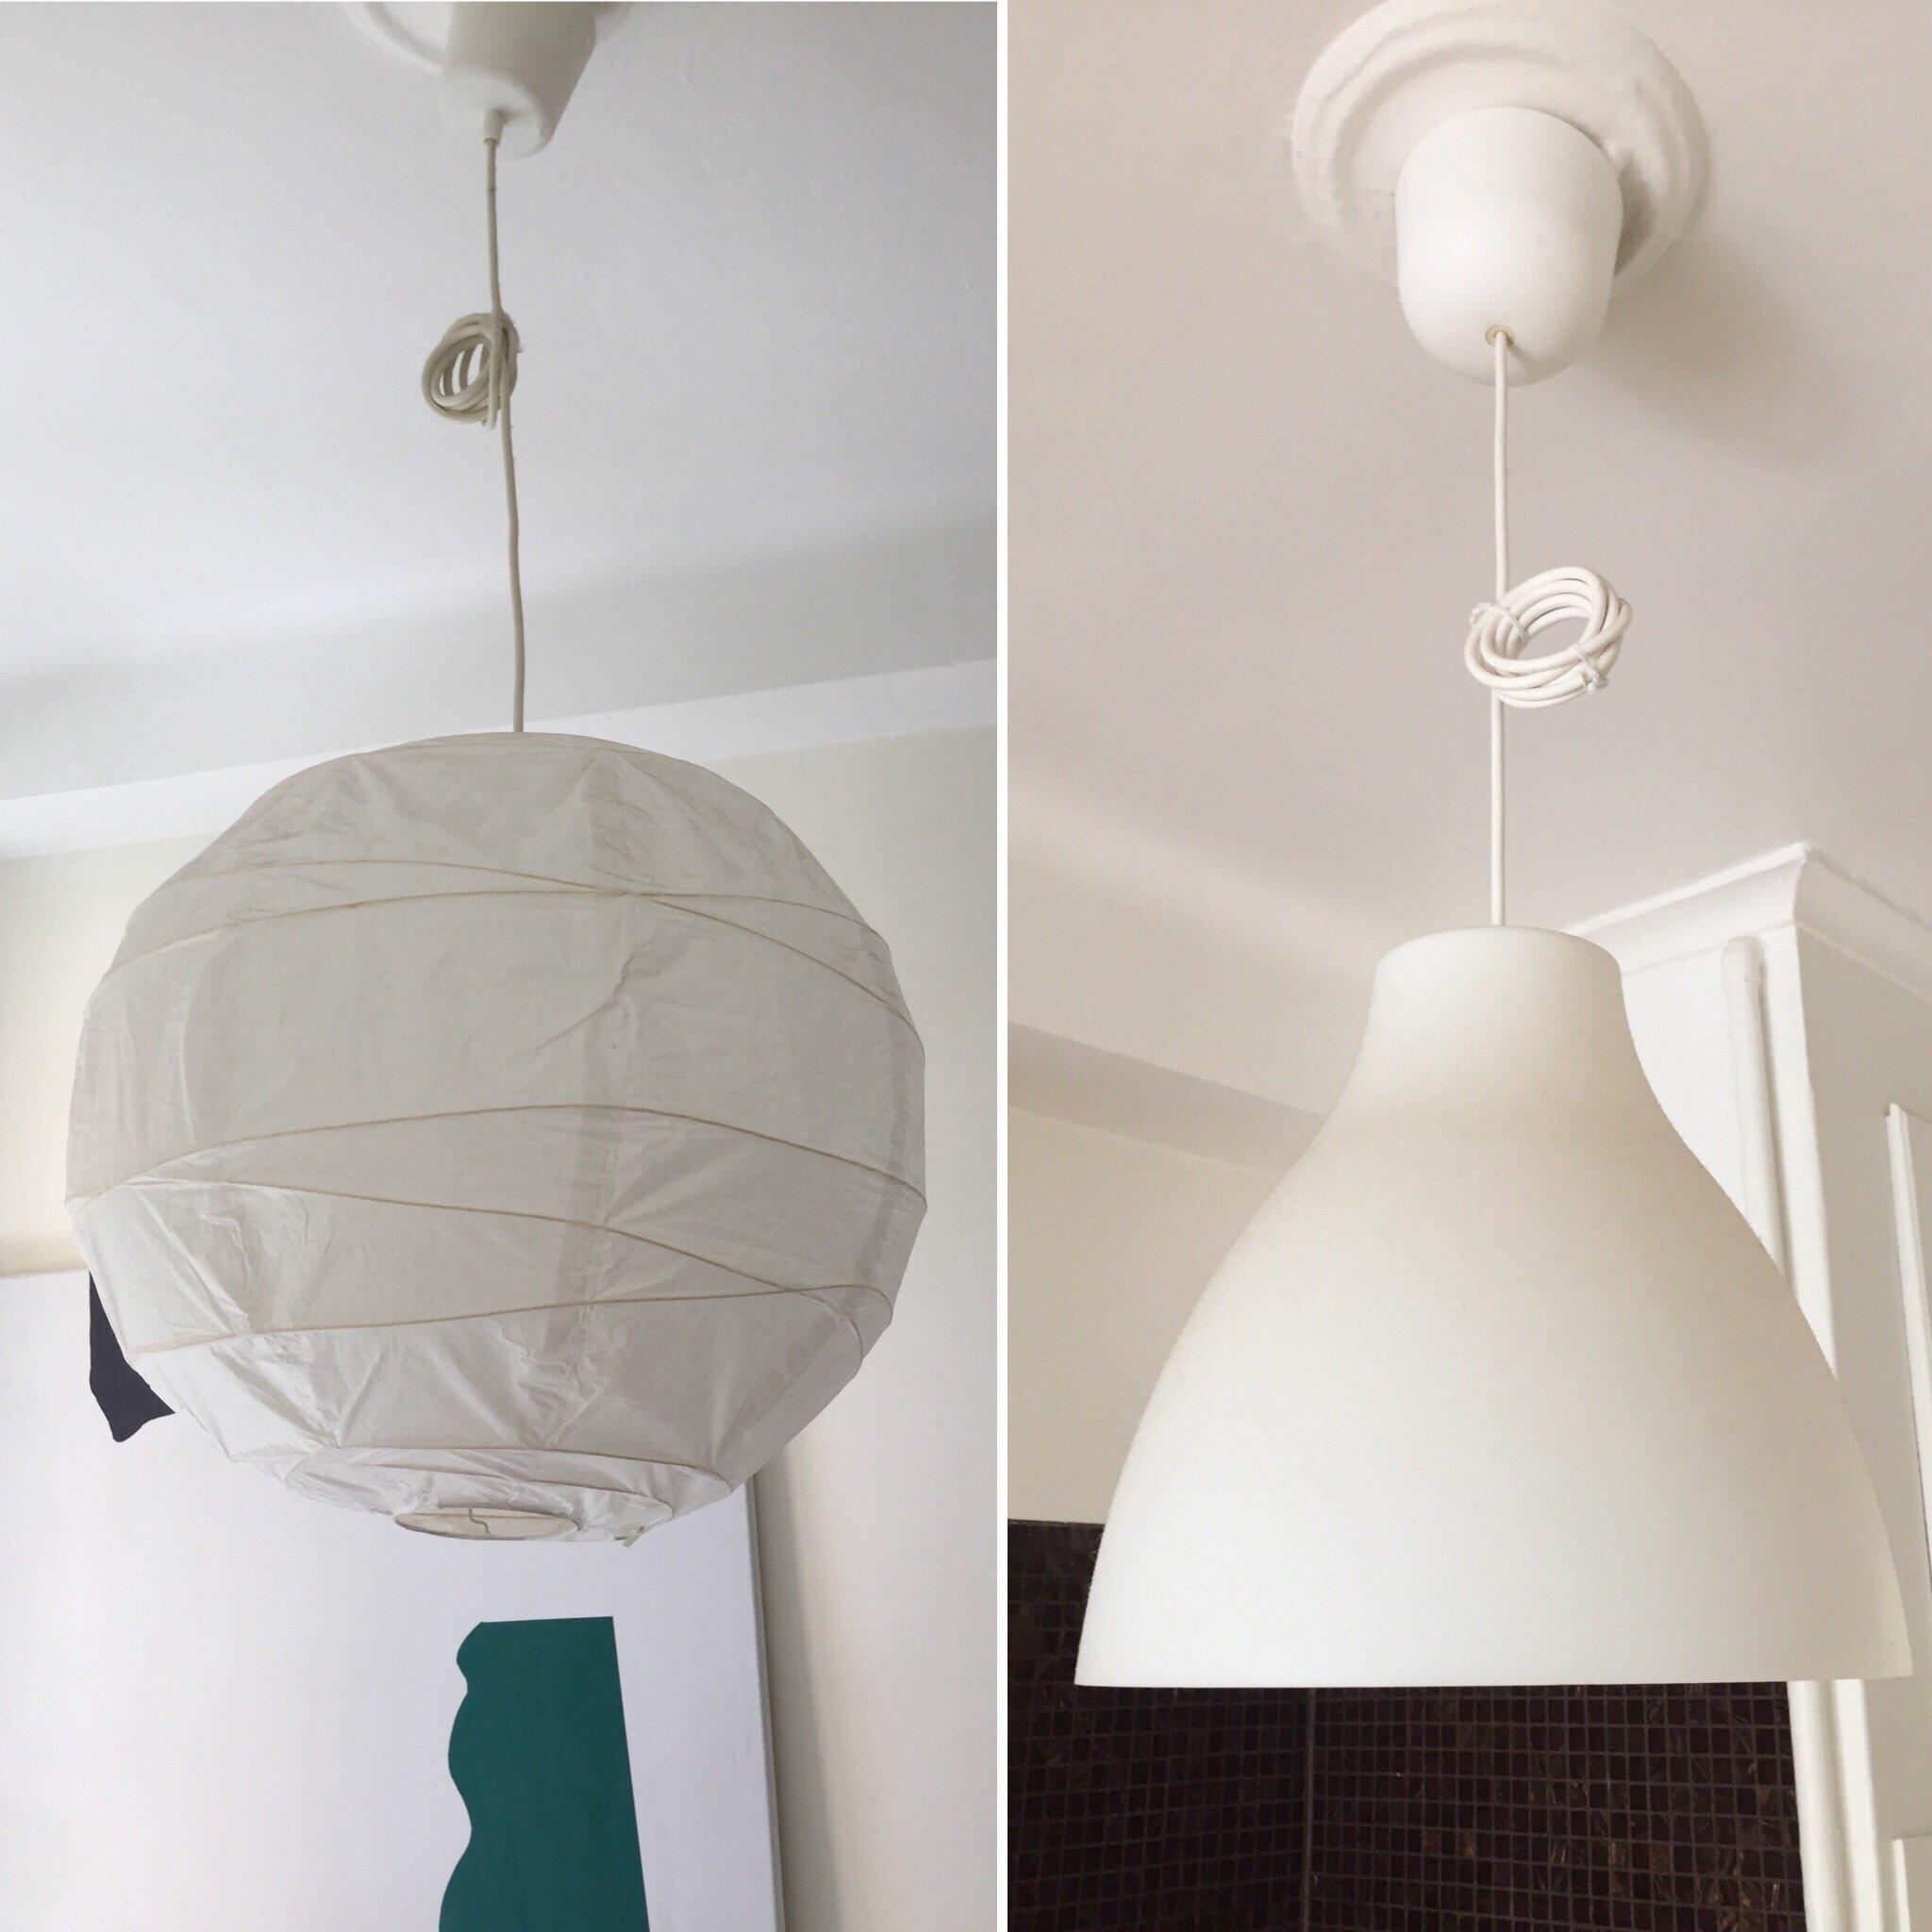 2 st lamp shades paket: Ikea Melodi & Regolit (408155516) ᐈ